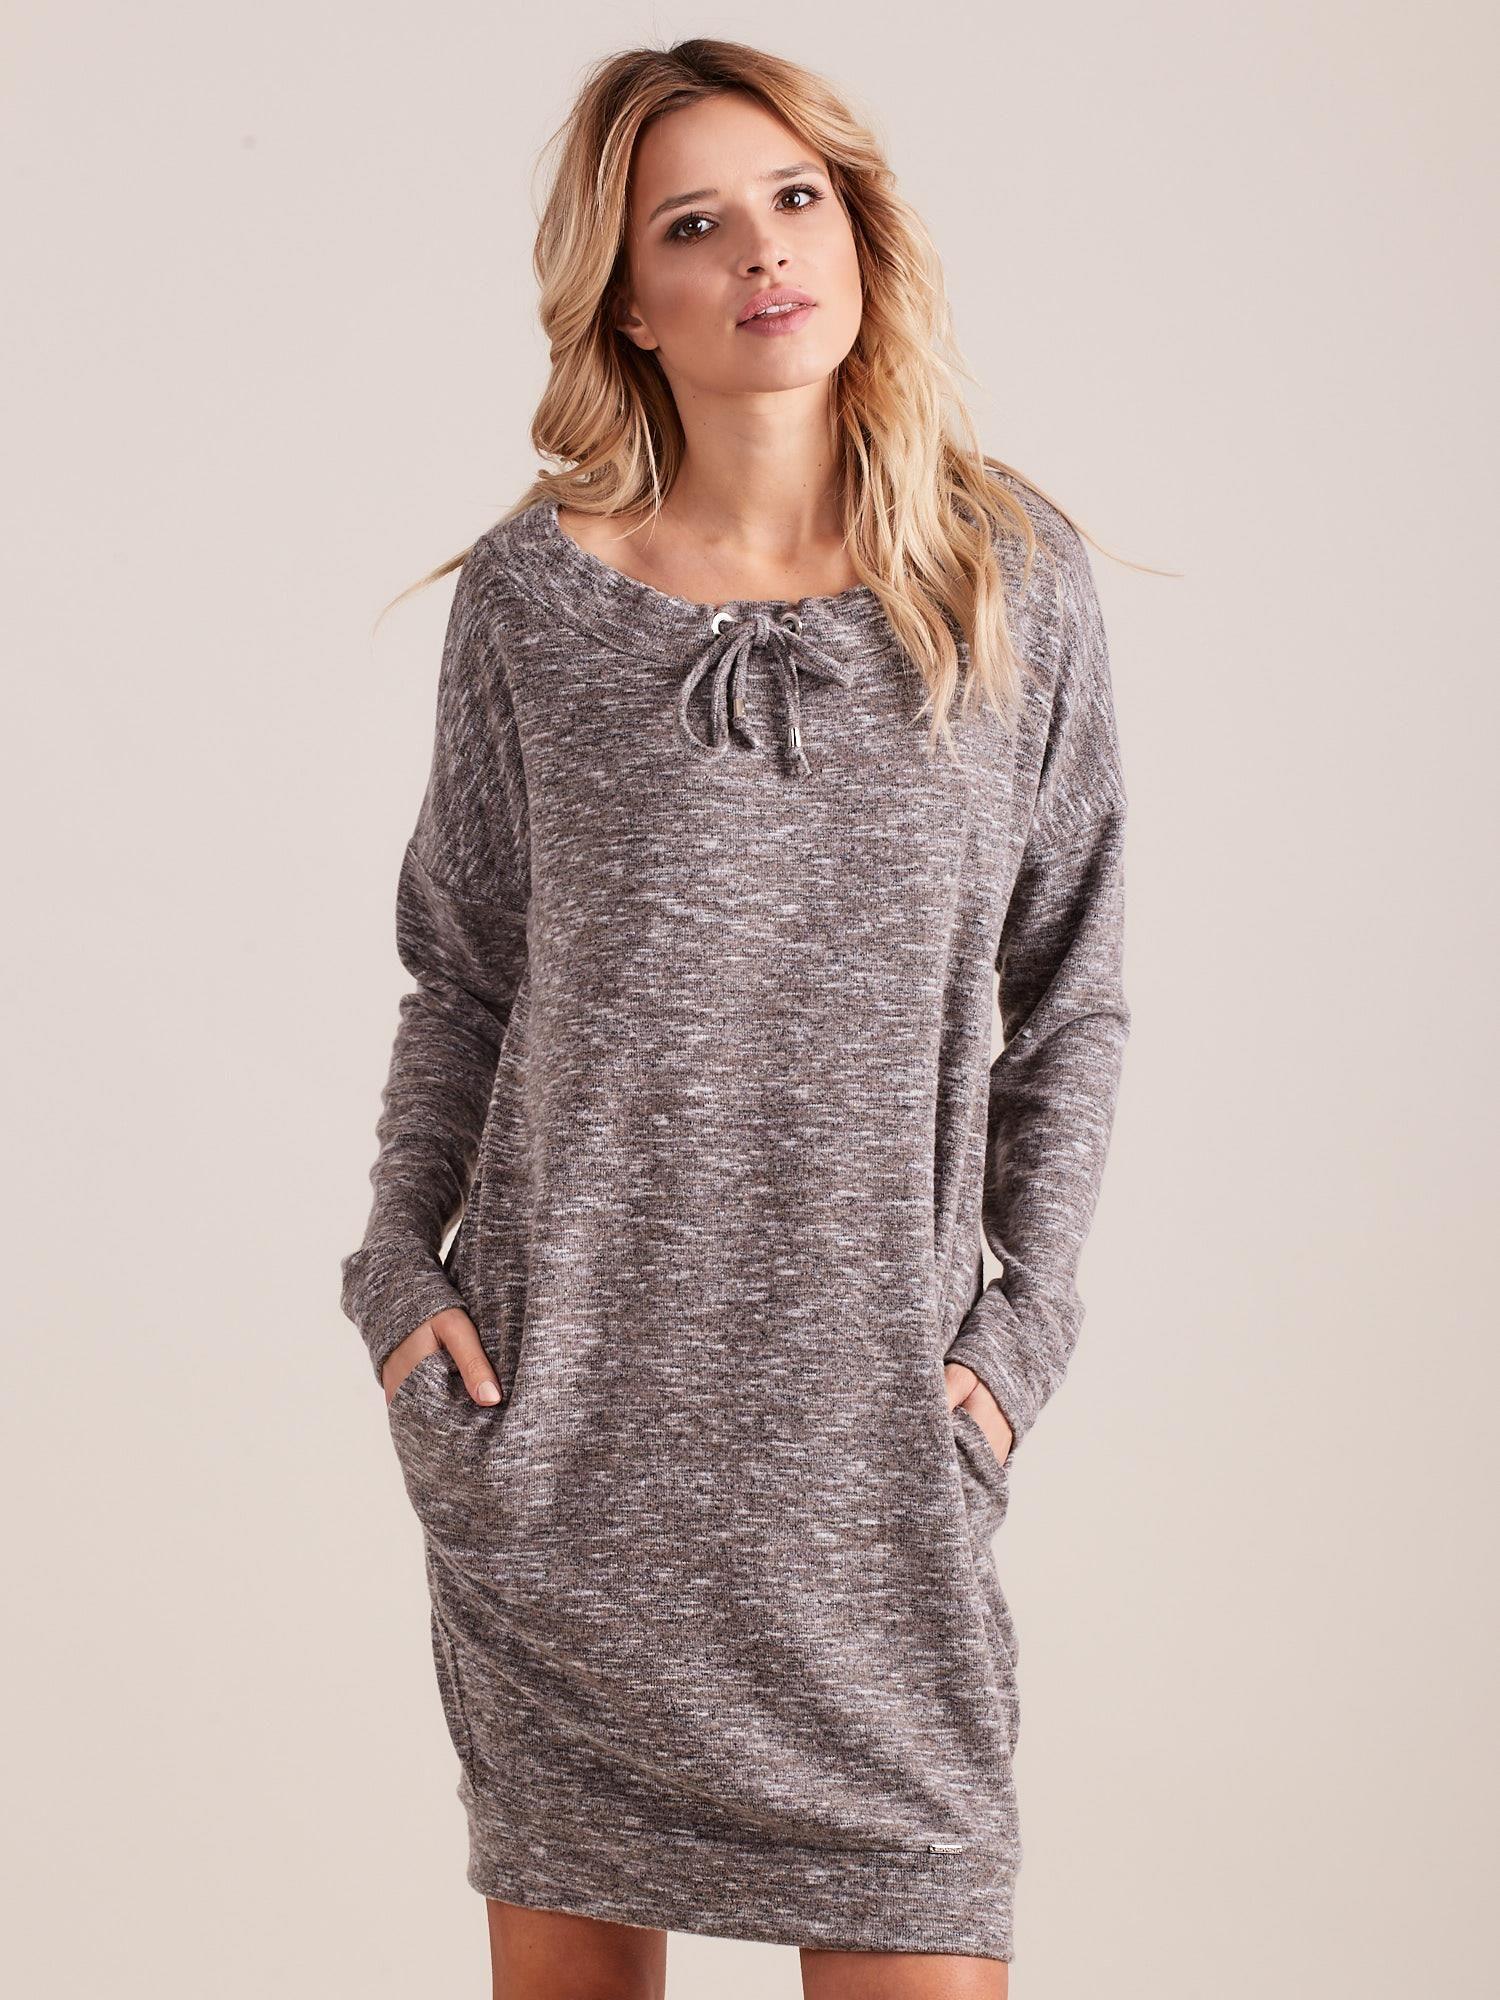 08b83216ec Beżowa dzianinowa sukienka melanżowa oversize - Sukienka dzianinowa ...